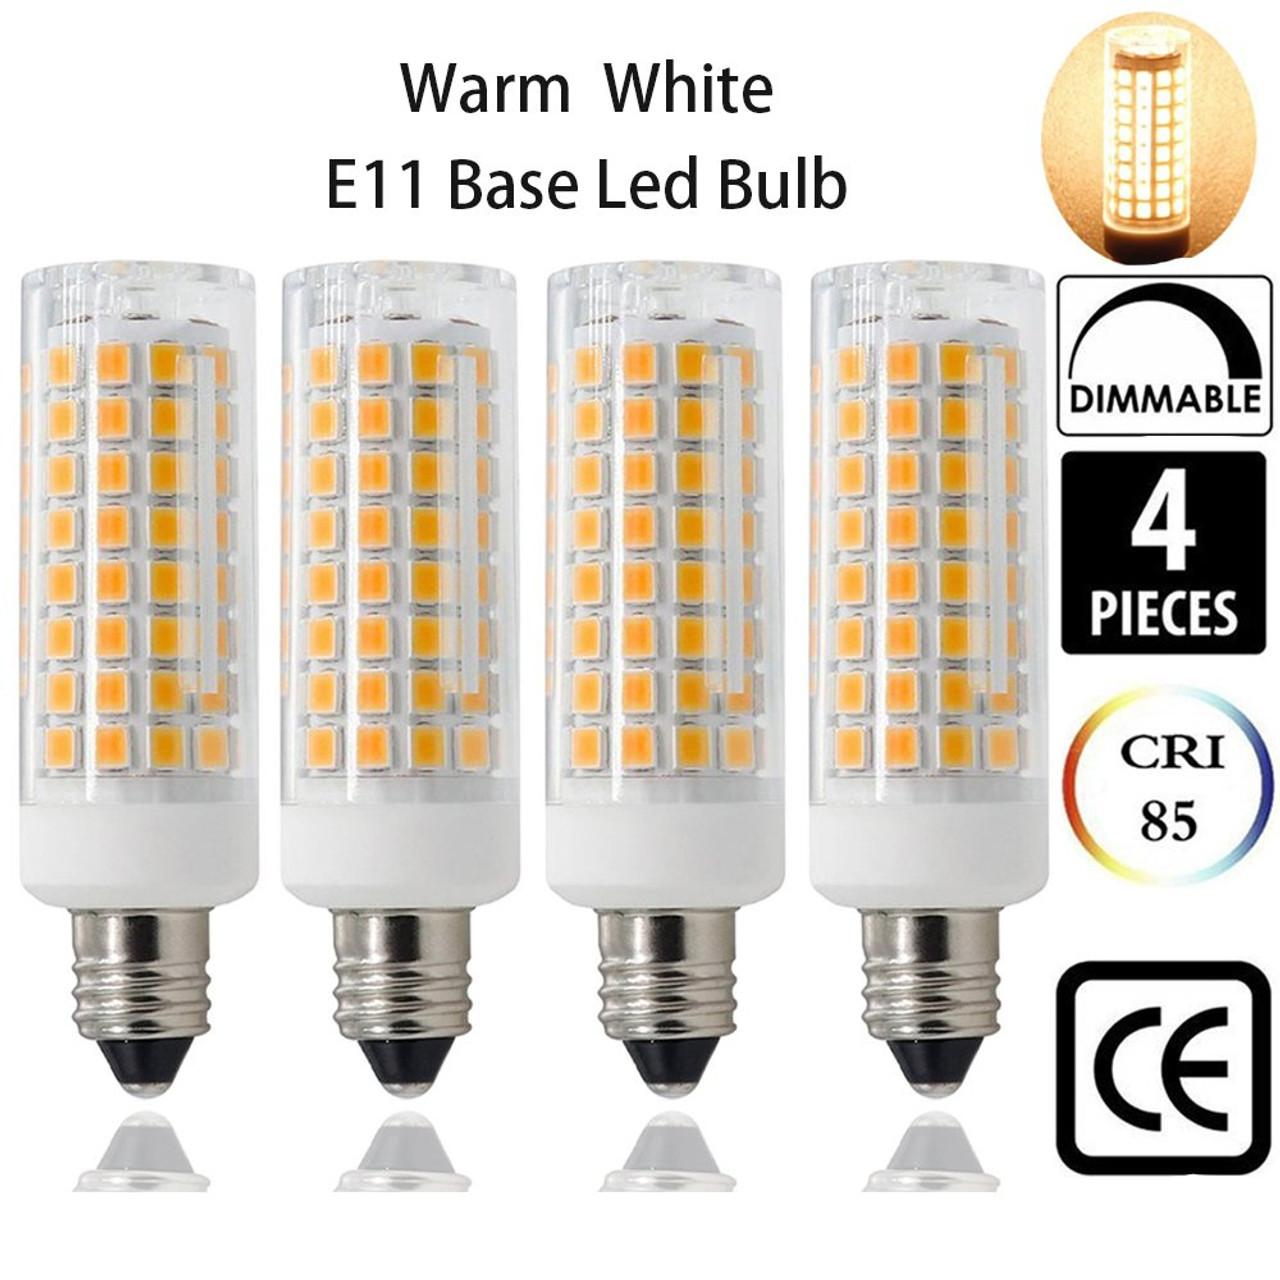 New E11 Led Light Bulbs All New 102 Leds Mini Candelabra Base Bulb Warm White 3000k 120 Volt 75w Or 100w Equivalent Halogen Replacement Lights 850